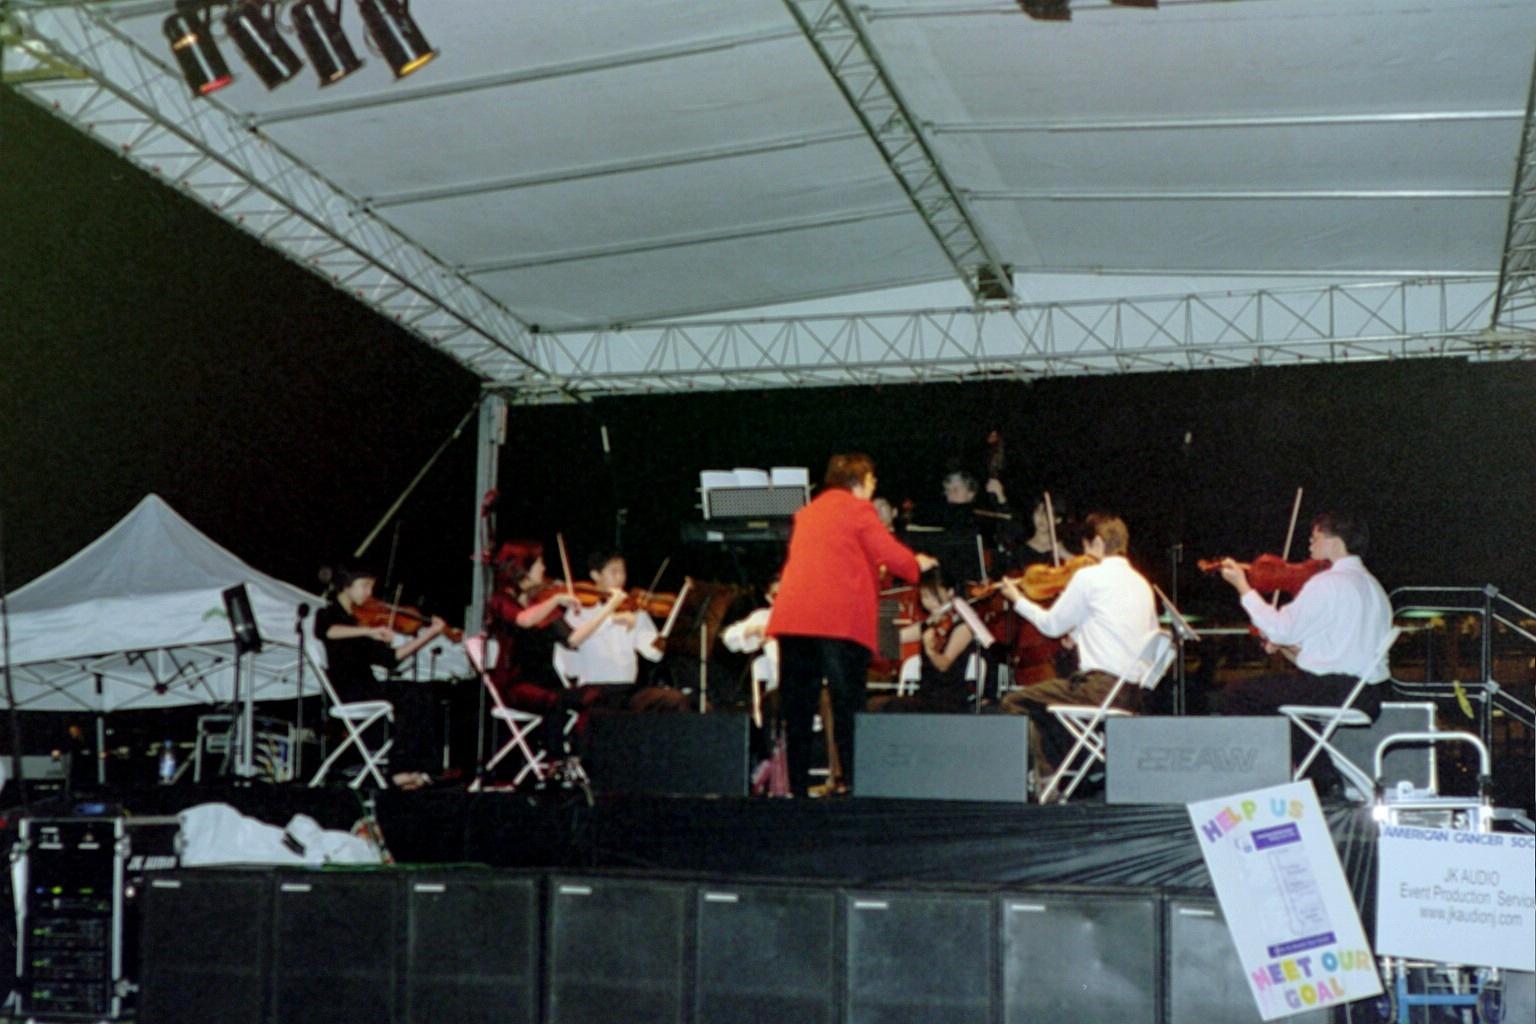 A powerful performance by the Bravura     string ensemble